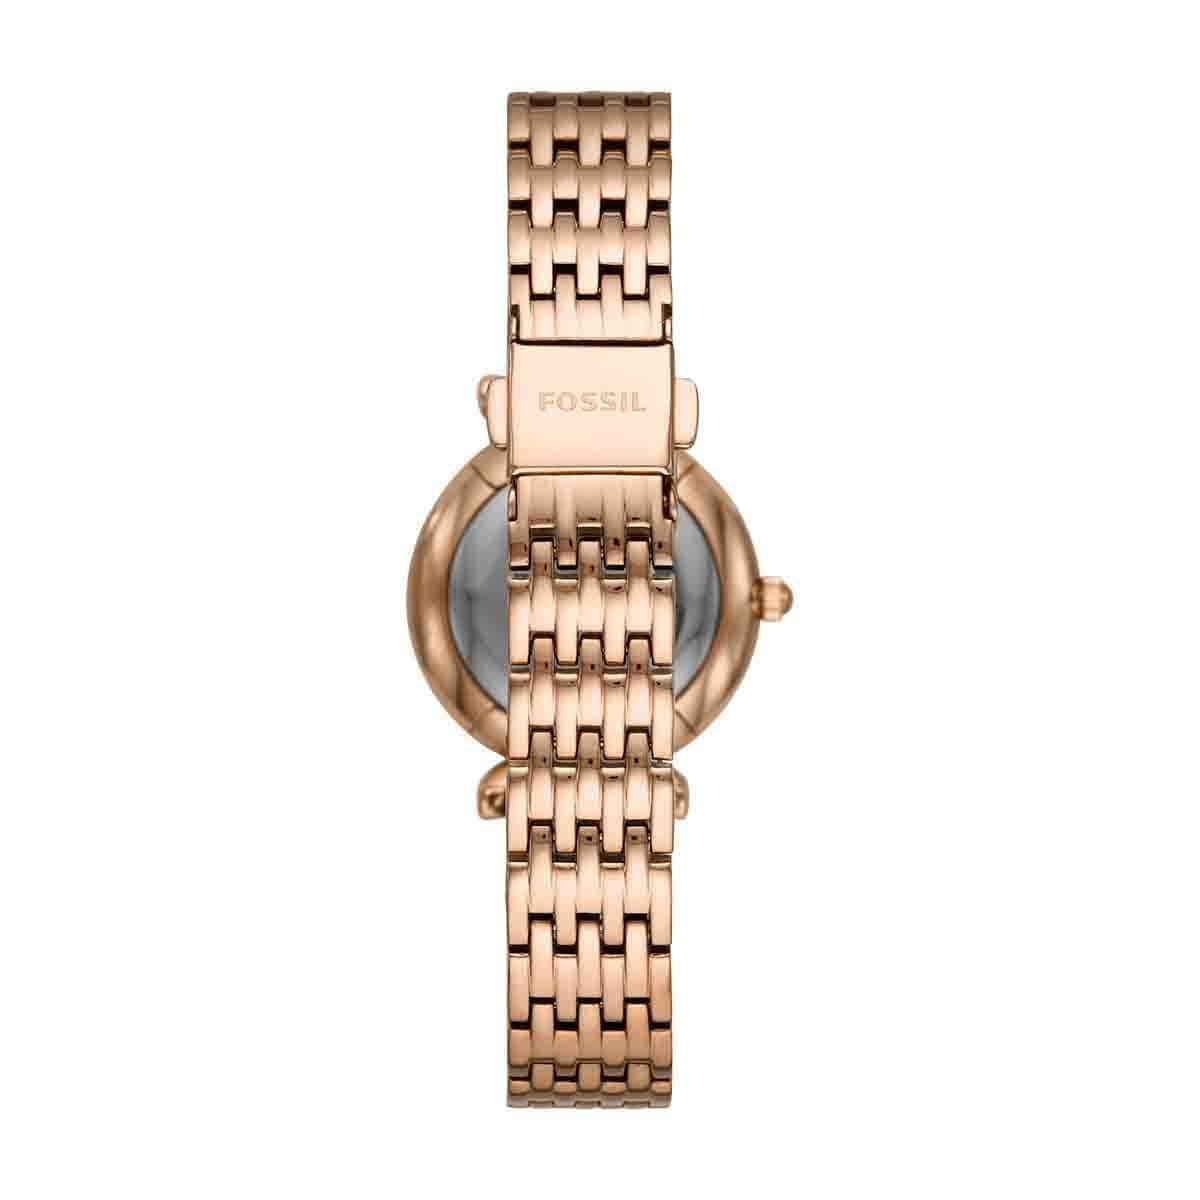 614332a906c1 Reloj para dama color oro rosado fossil